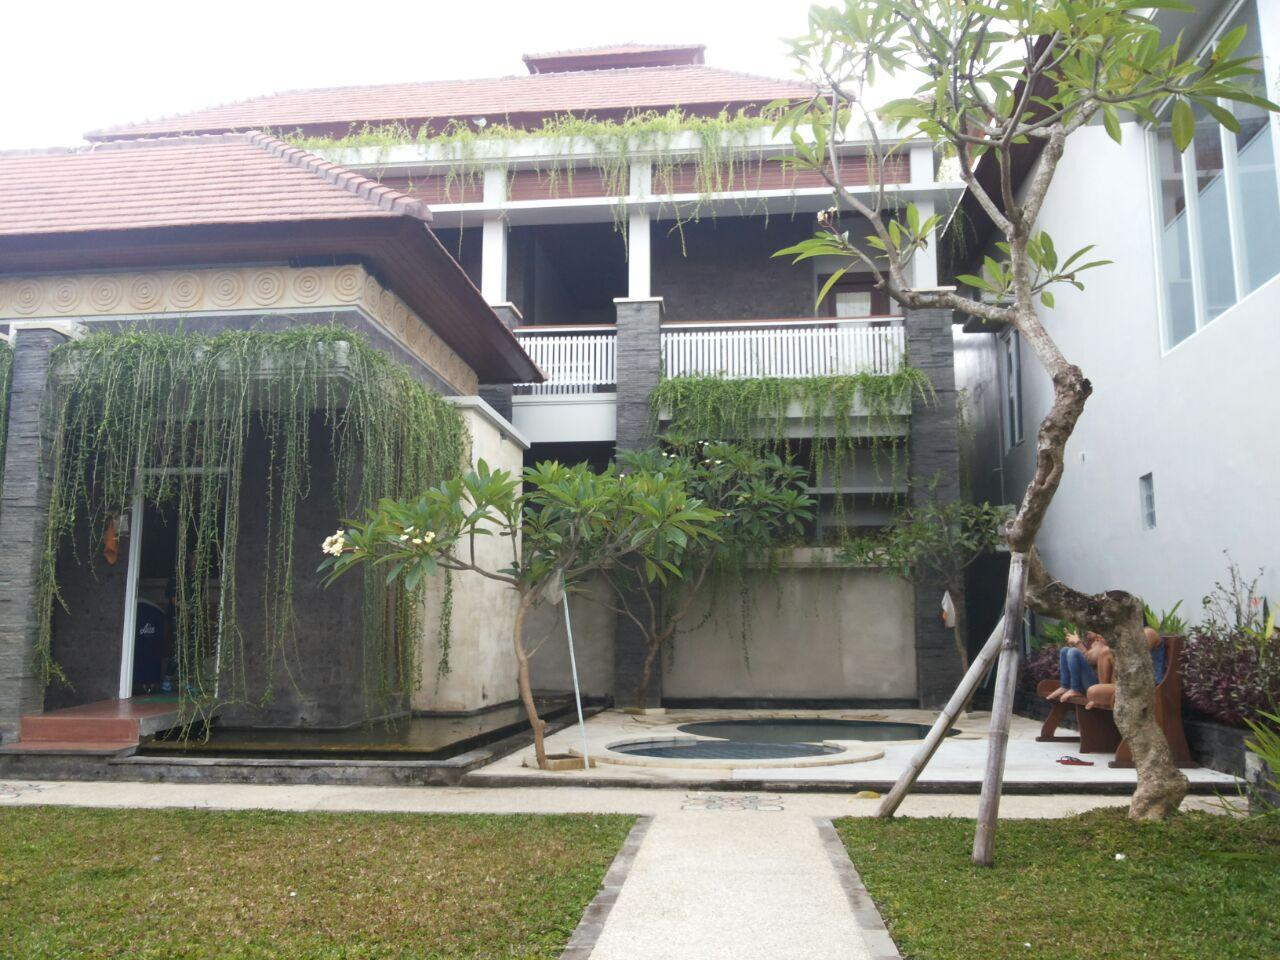 Hotel Merta Sari Jw Menuh I, Denpasar